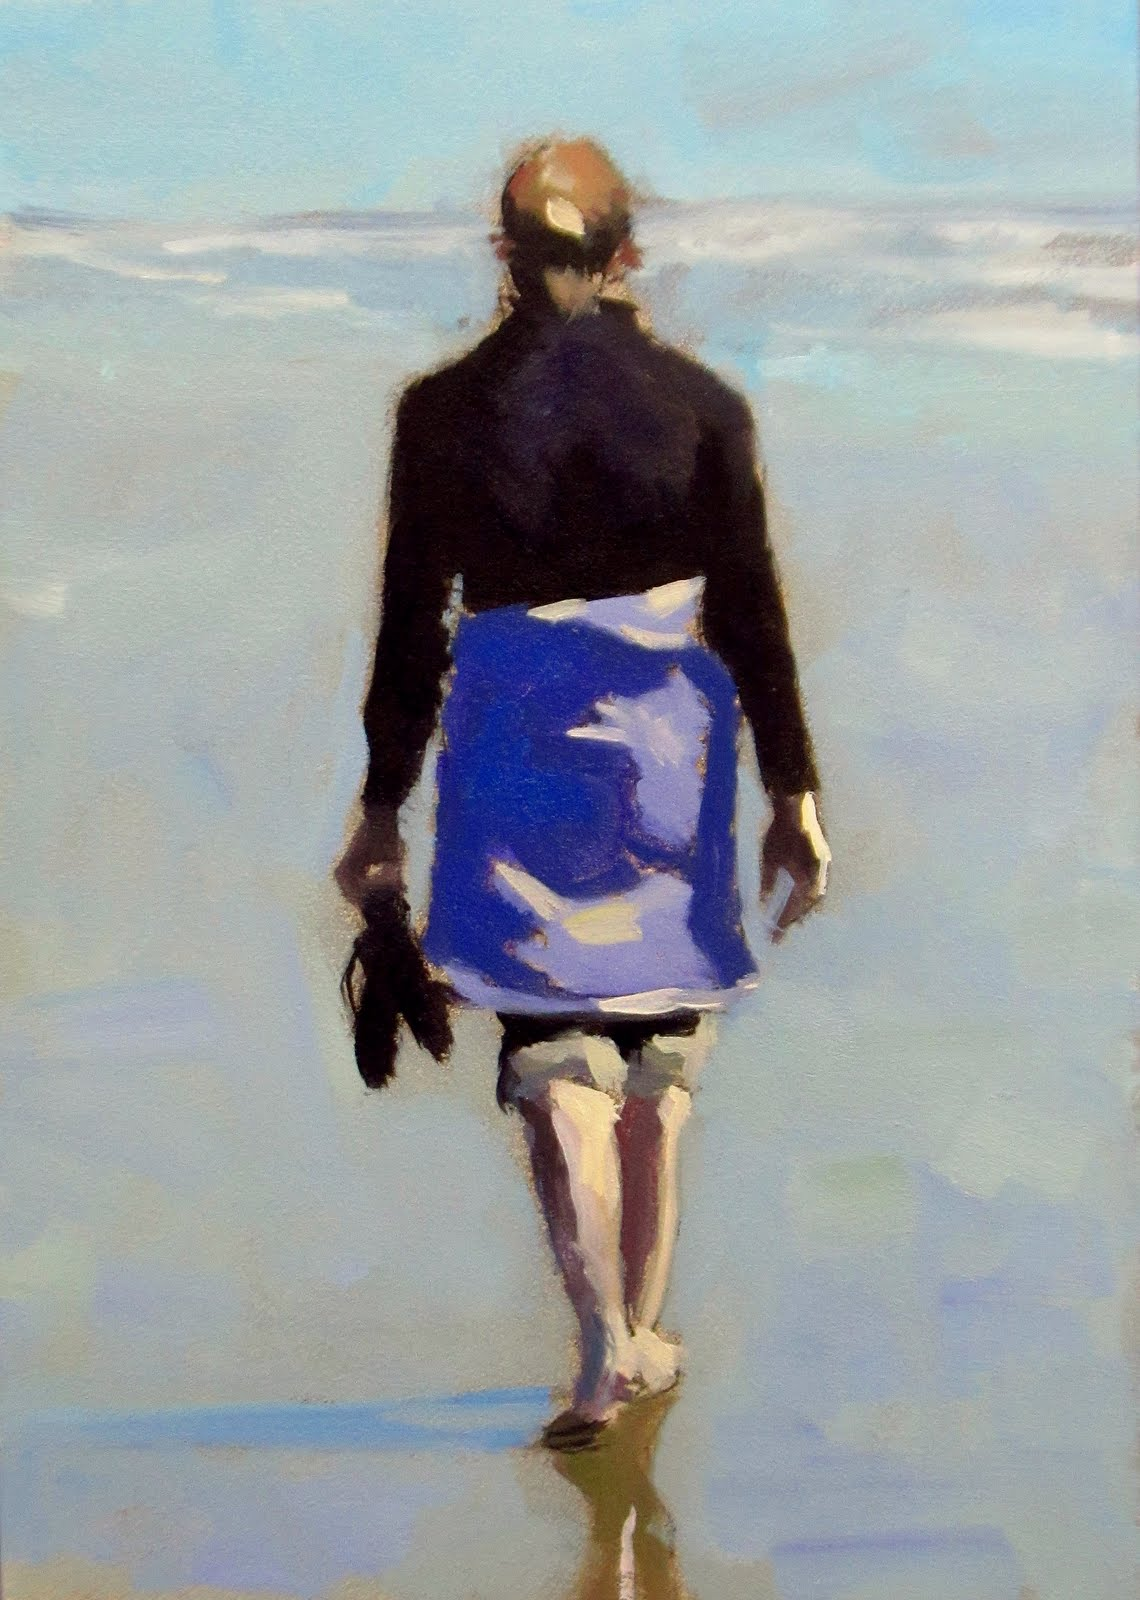 """DAILY DIAPER #197 Sandals and Surf"" original fine art by Brian Burt"